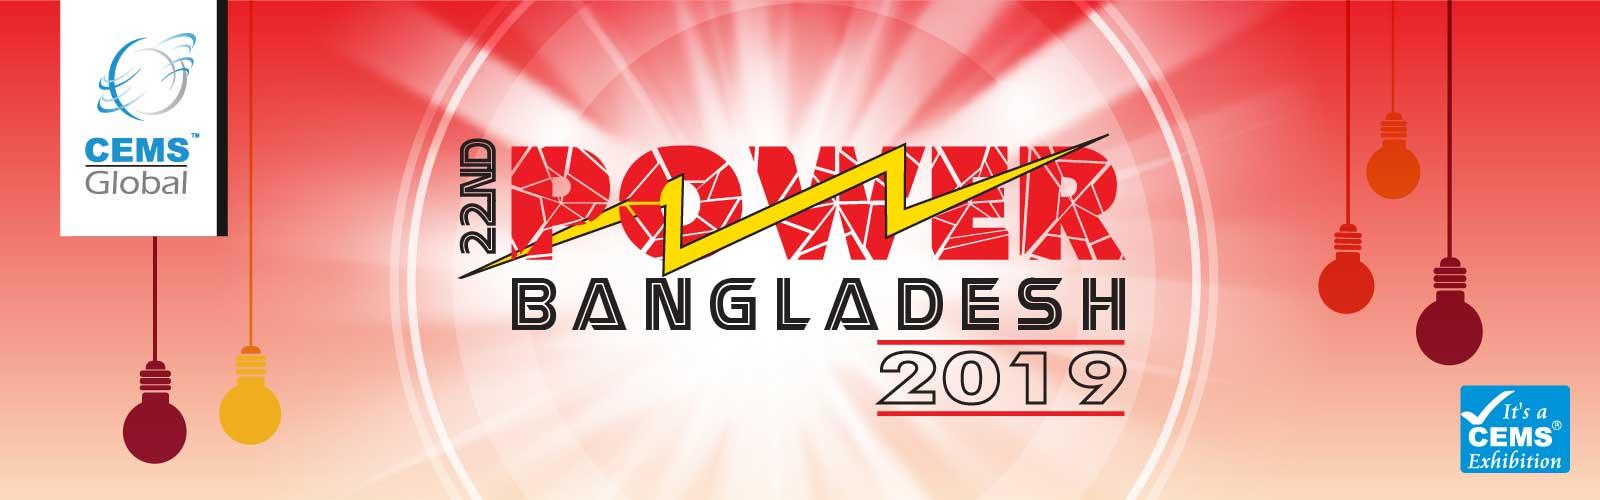 22nd Power Bangladesh 2019 International Expo